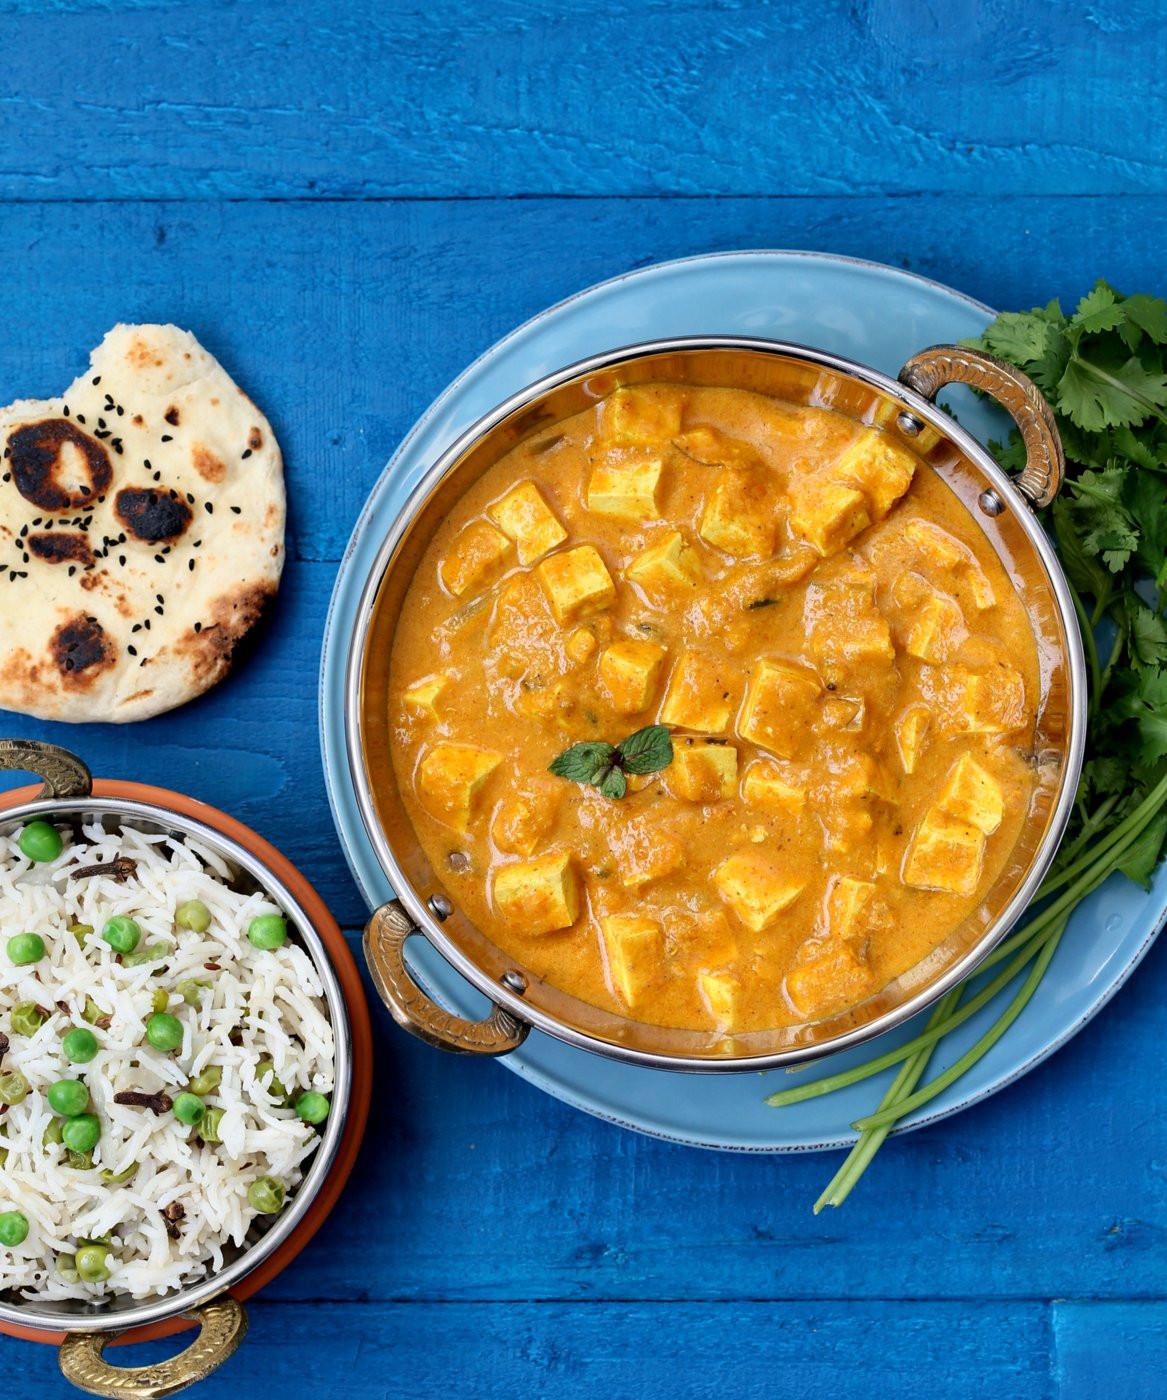 Indian Tofu Recipes  Mango Tofu Curry Vegan Richa's Indian Kitchen Giveaway